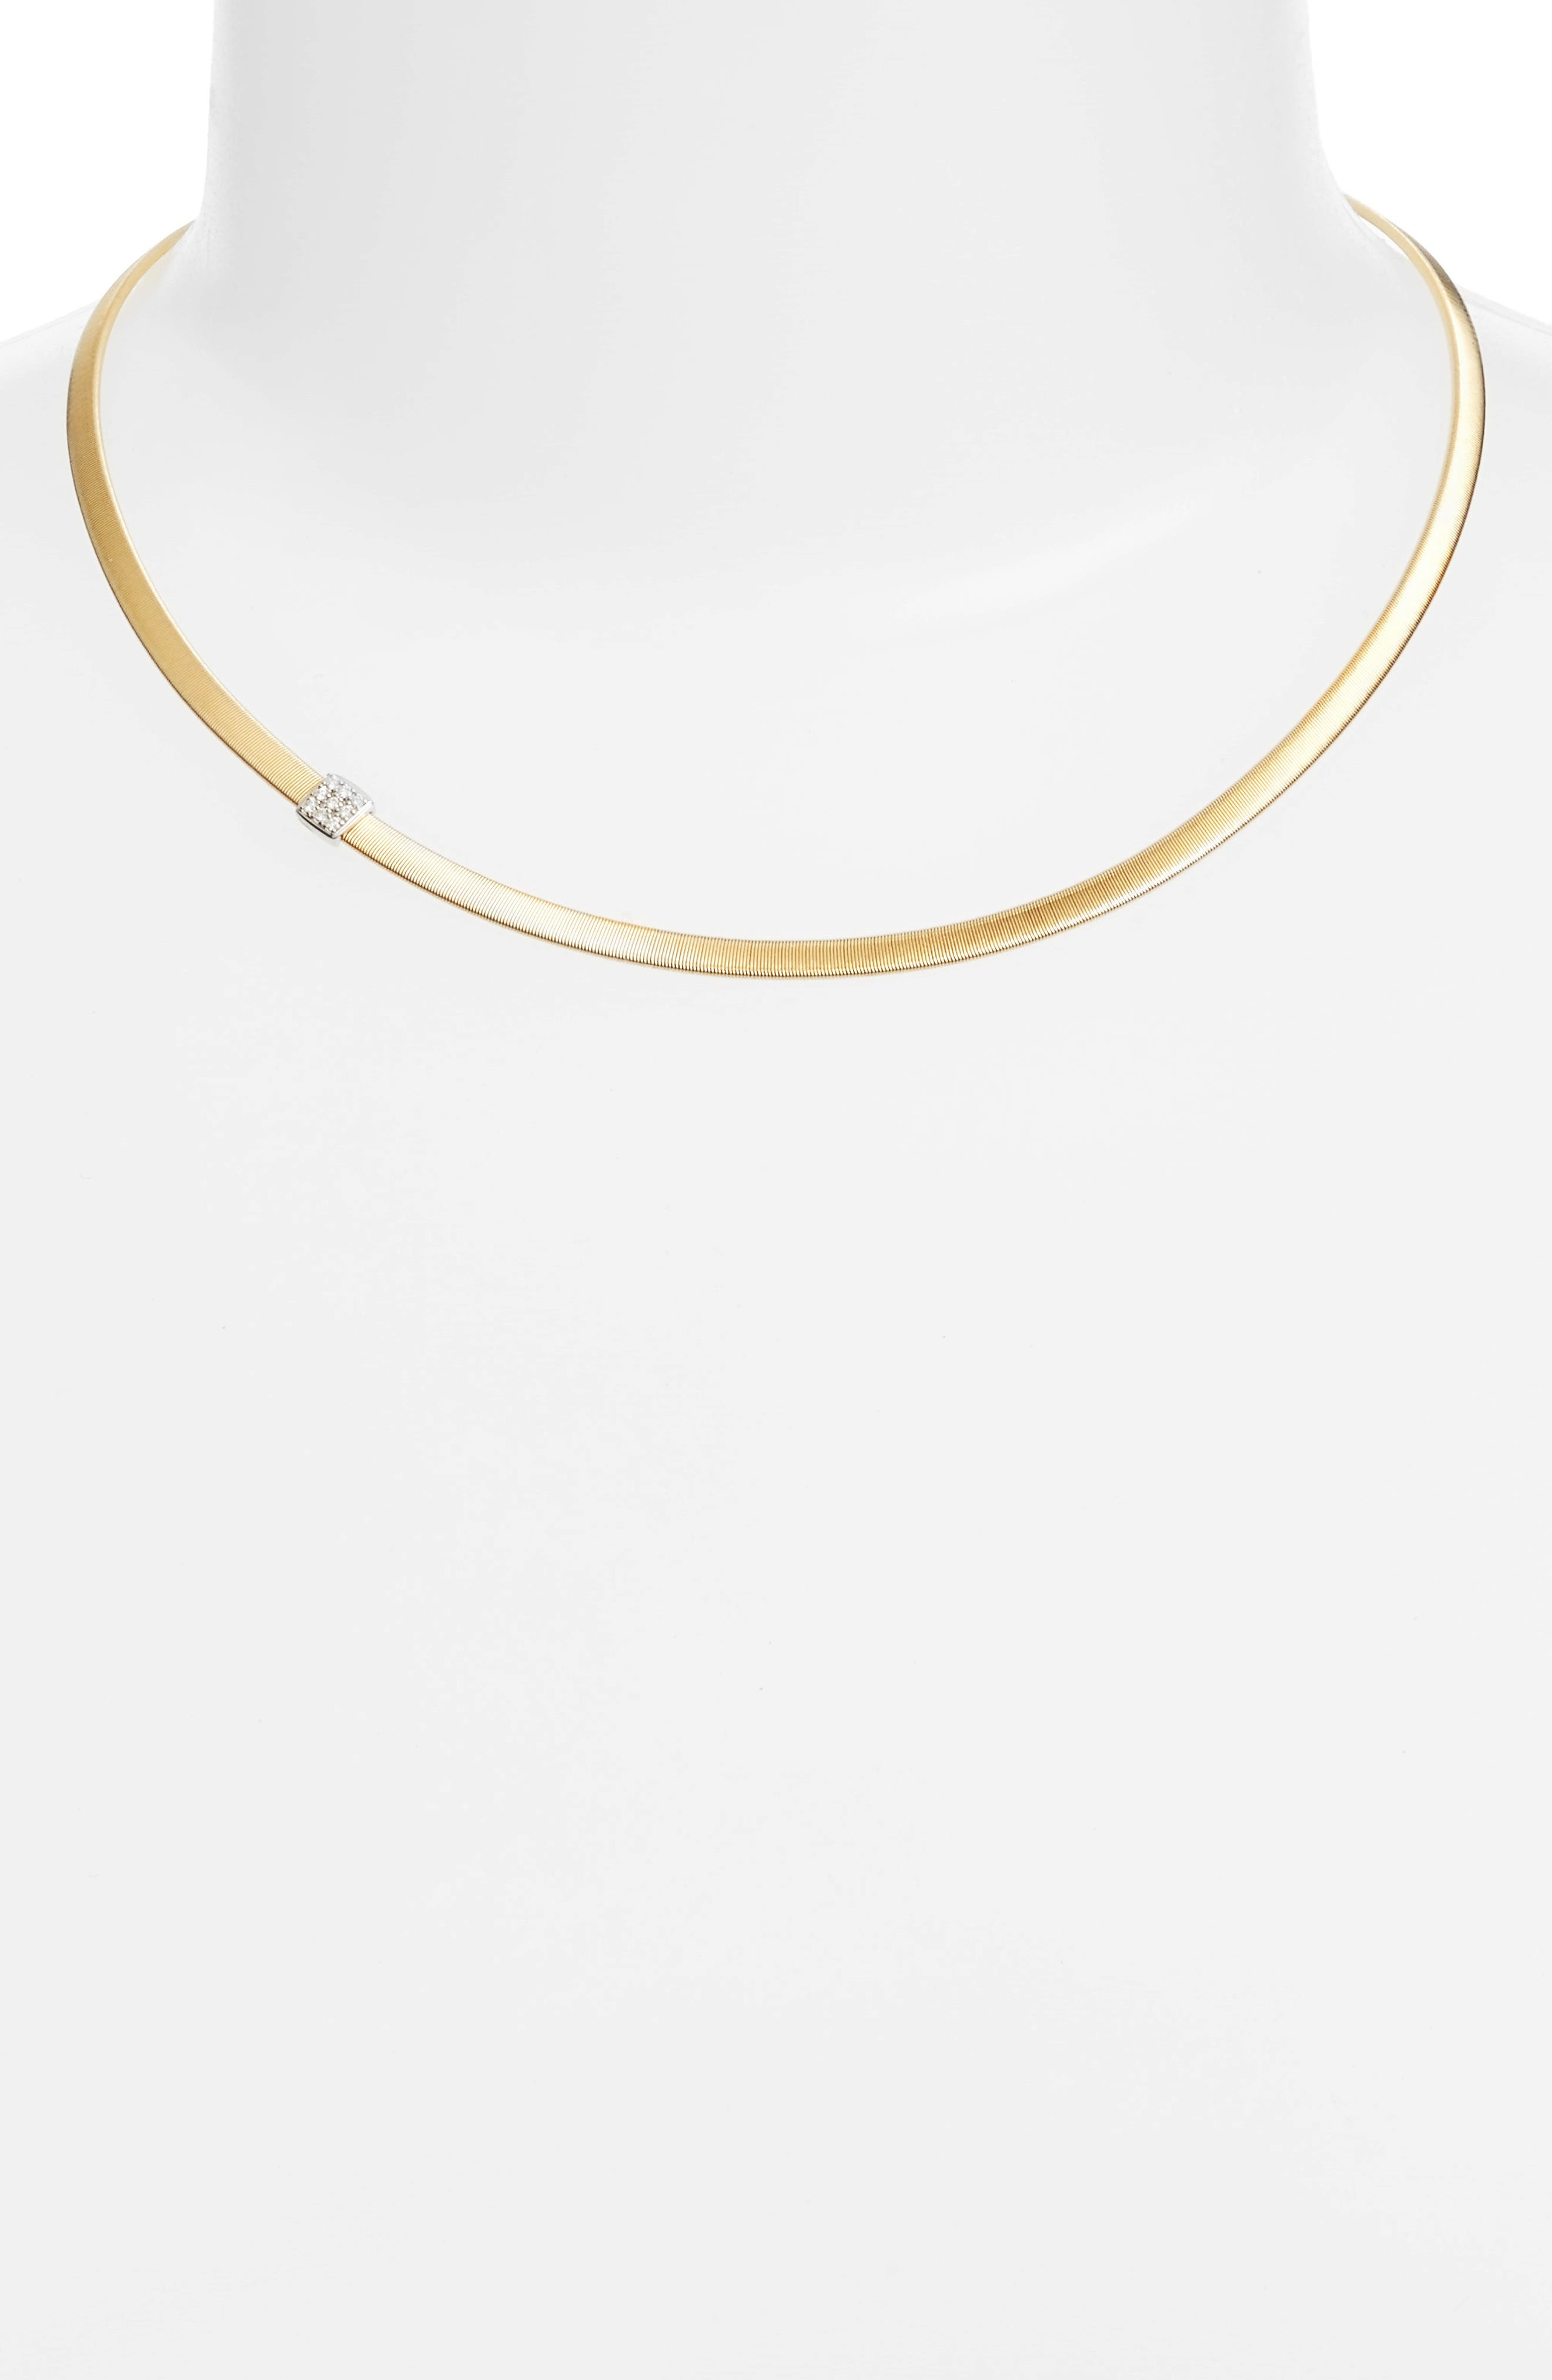 Masai Diamond Collar Necklace,                             Alternate thumbnail 2, color,                             YELLOW GOLD